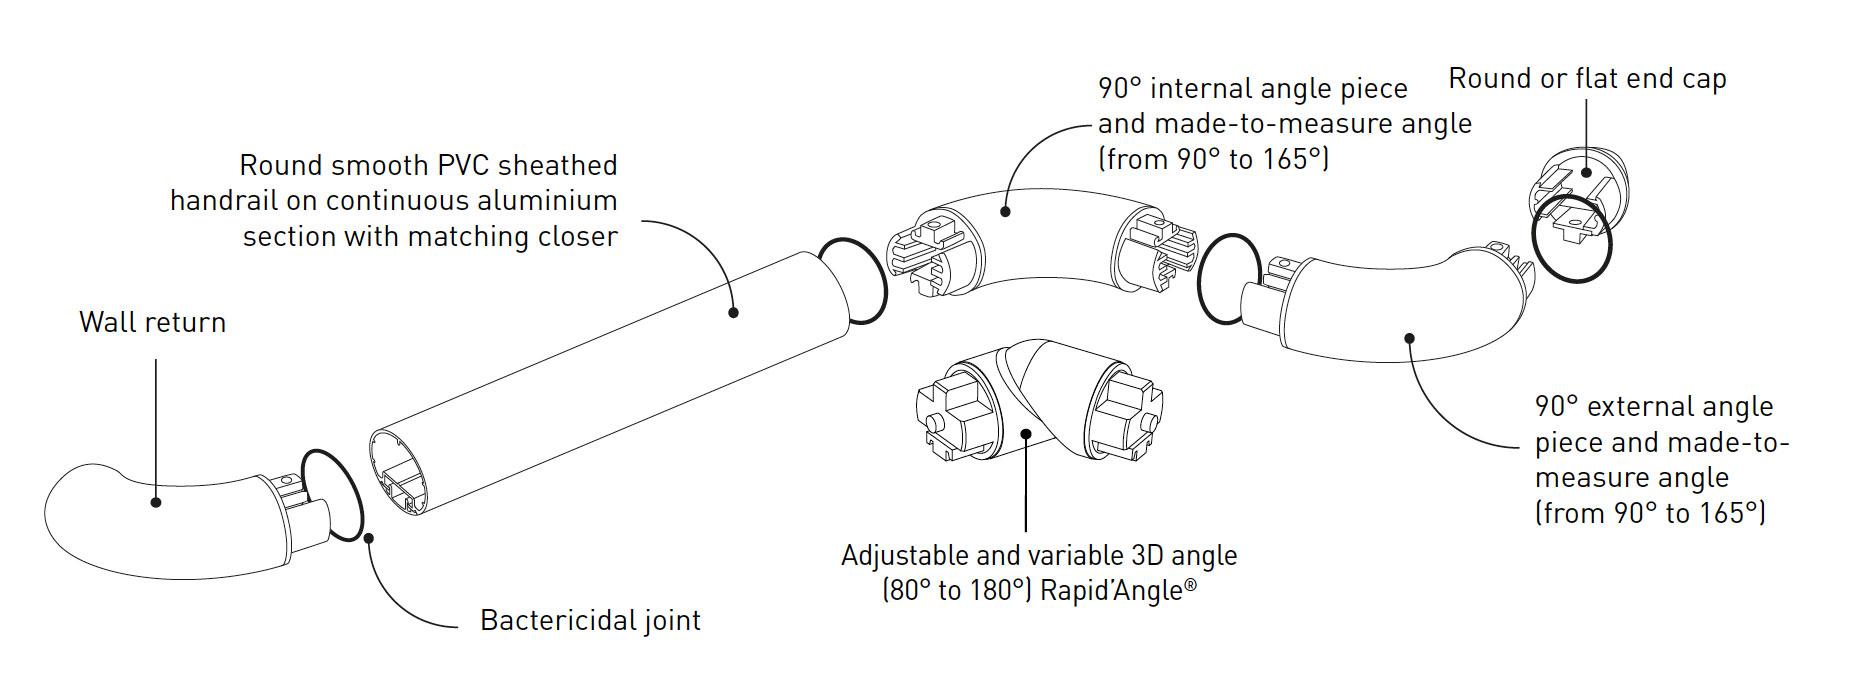 SPM Escort Leuning onderdelen tekening